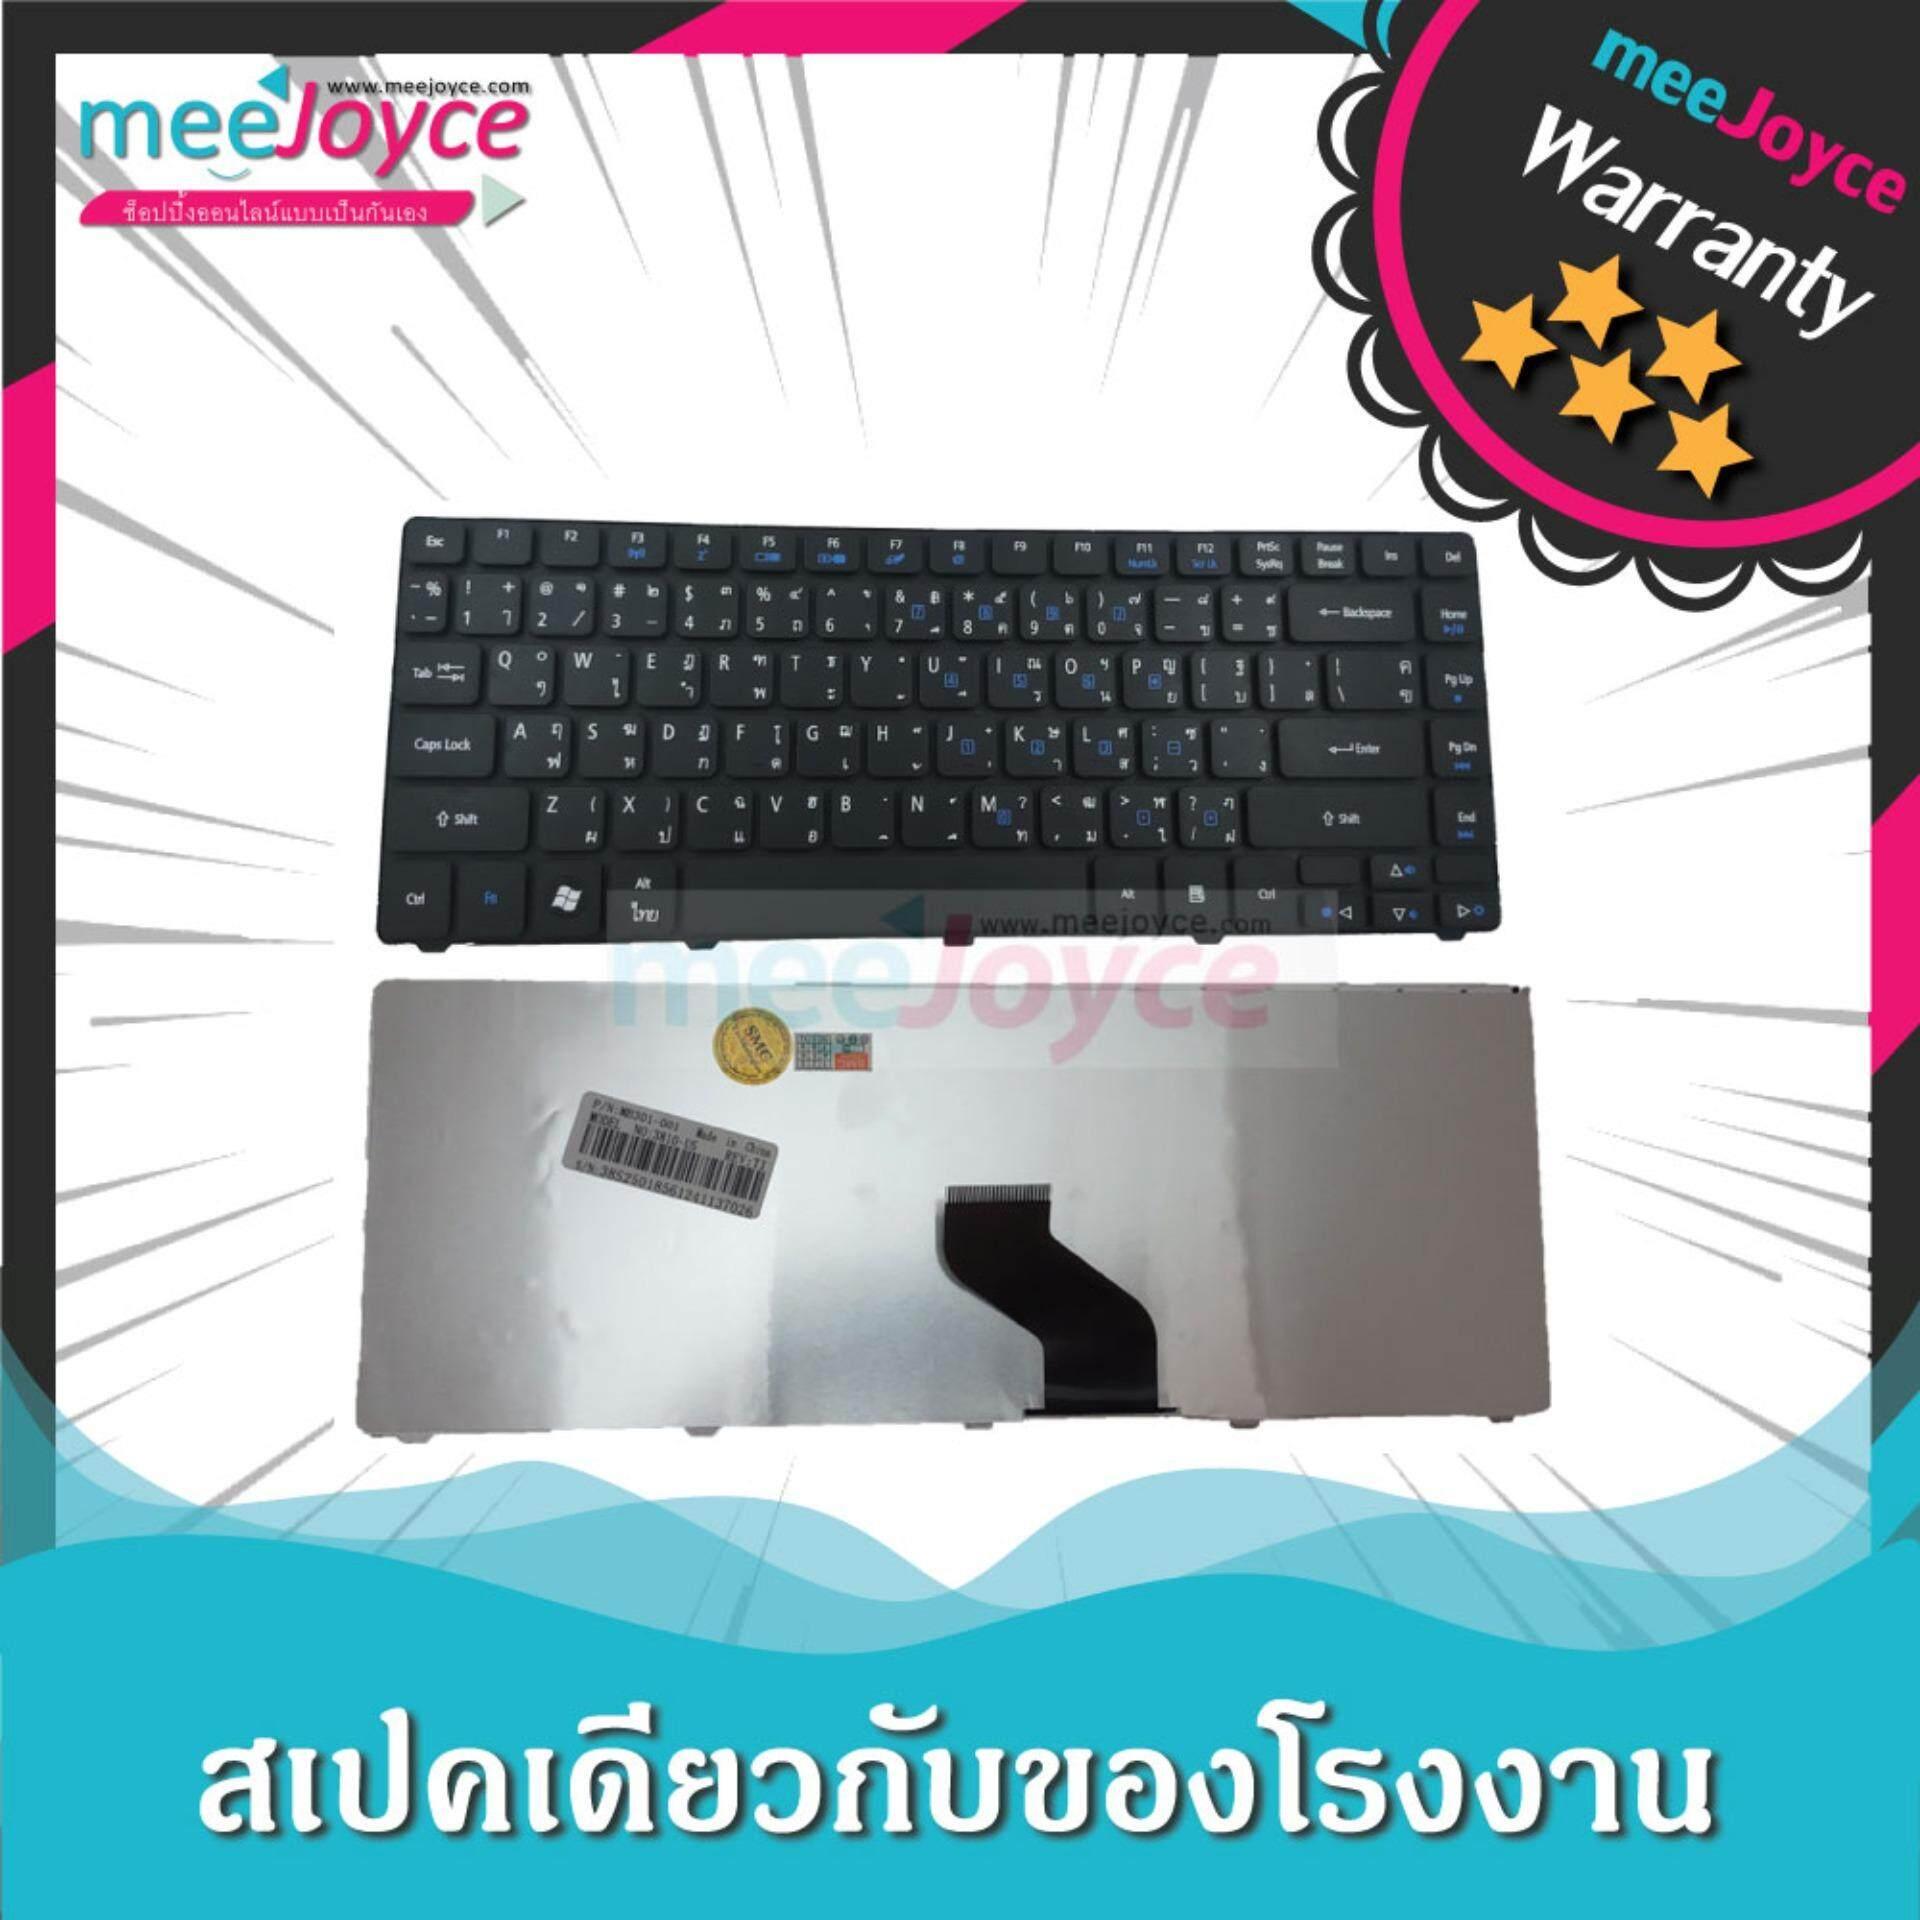 Acer Keyboard Laptop Aspire 4253 4352 4349 4535 4540 4736 4738 4739 4740 3810 4743 4741 4745 4750 4752 4750g 4551 Emachine